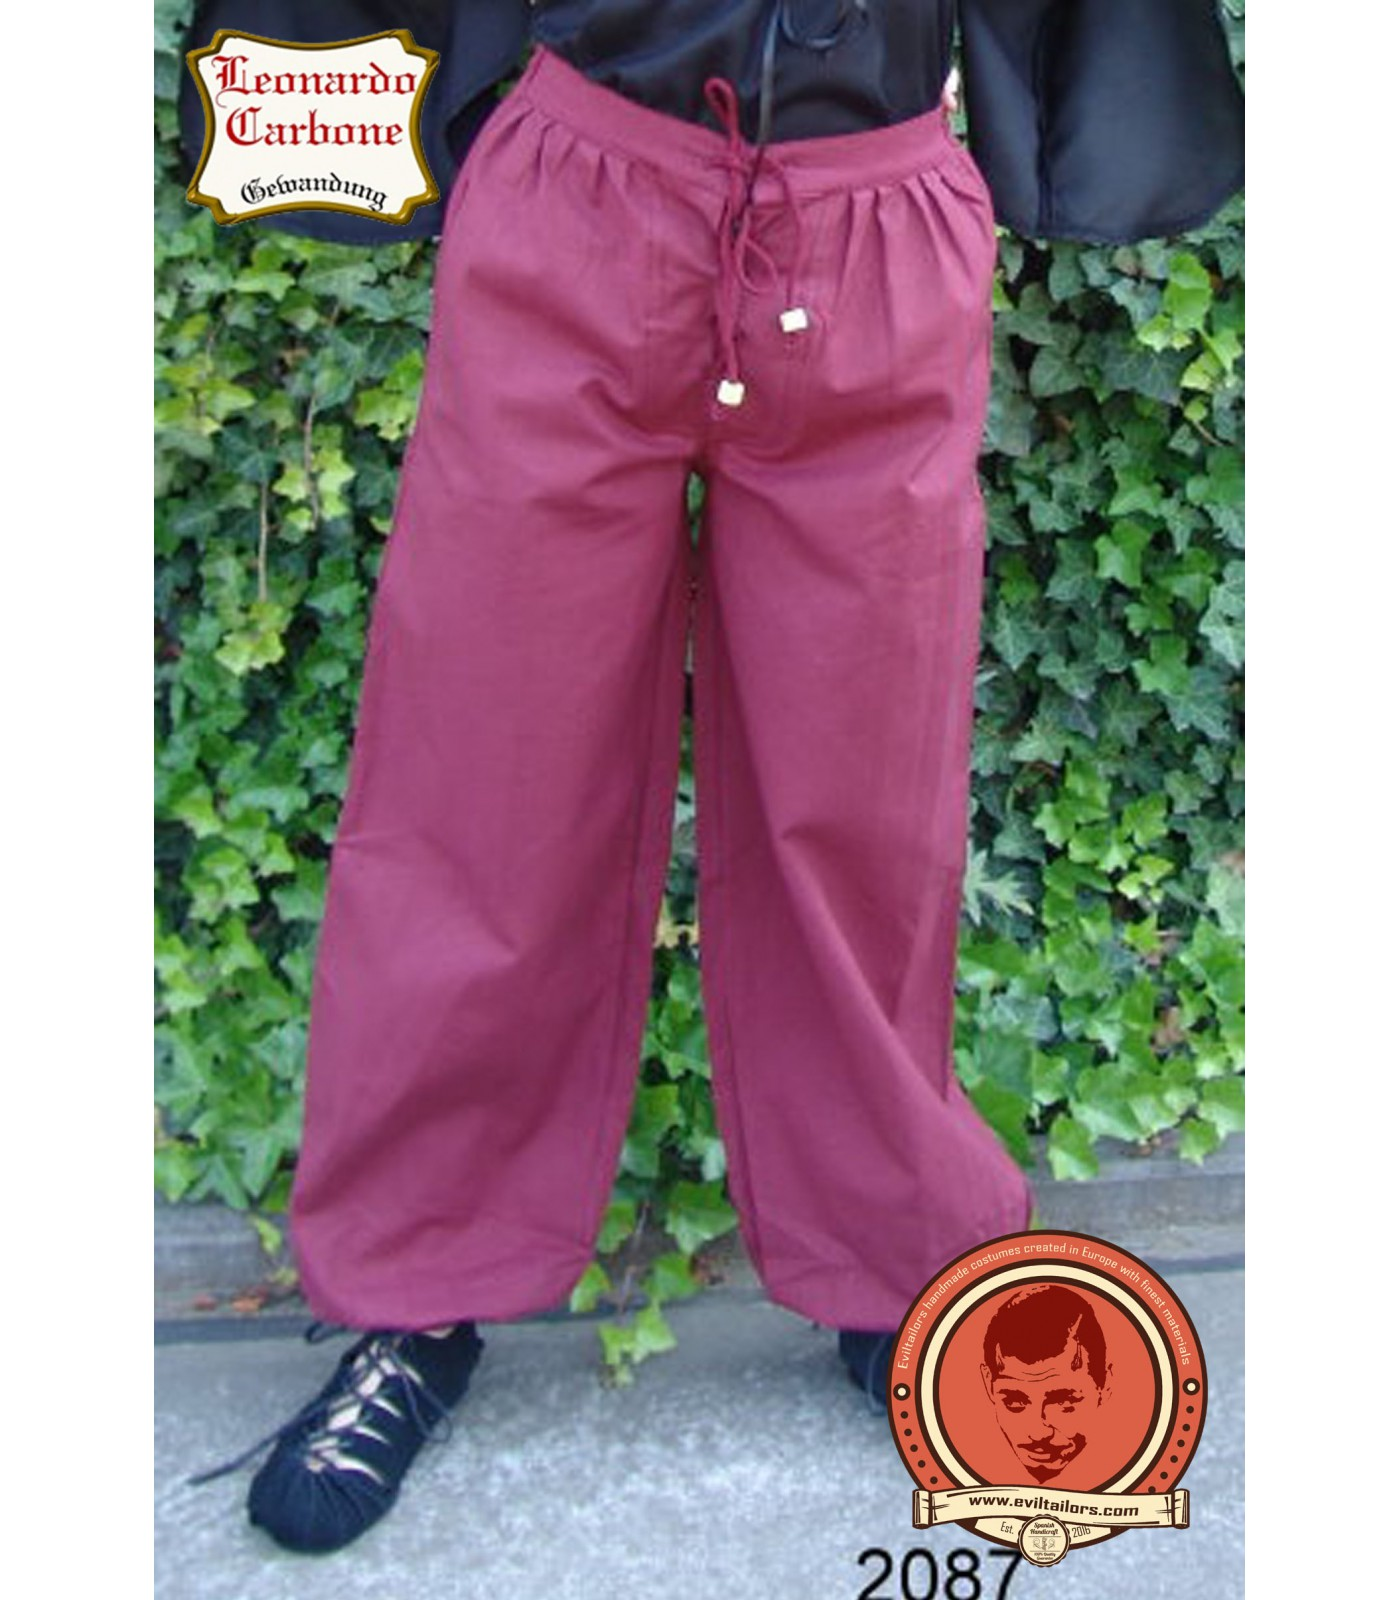 Pantalones de algodón medieval clásico Rüdiger - Eviltailors